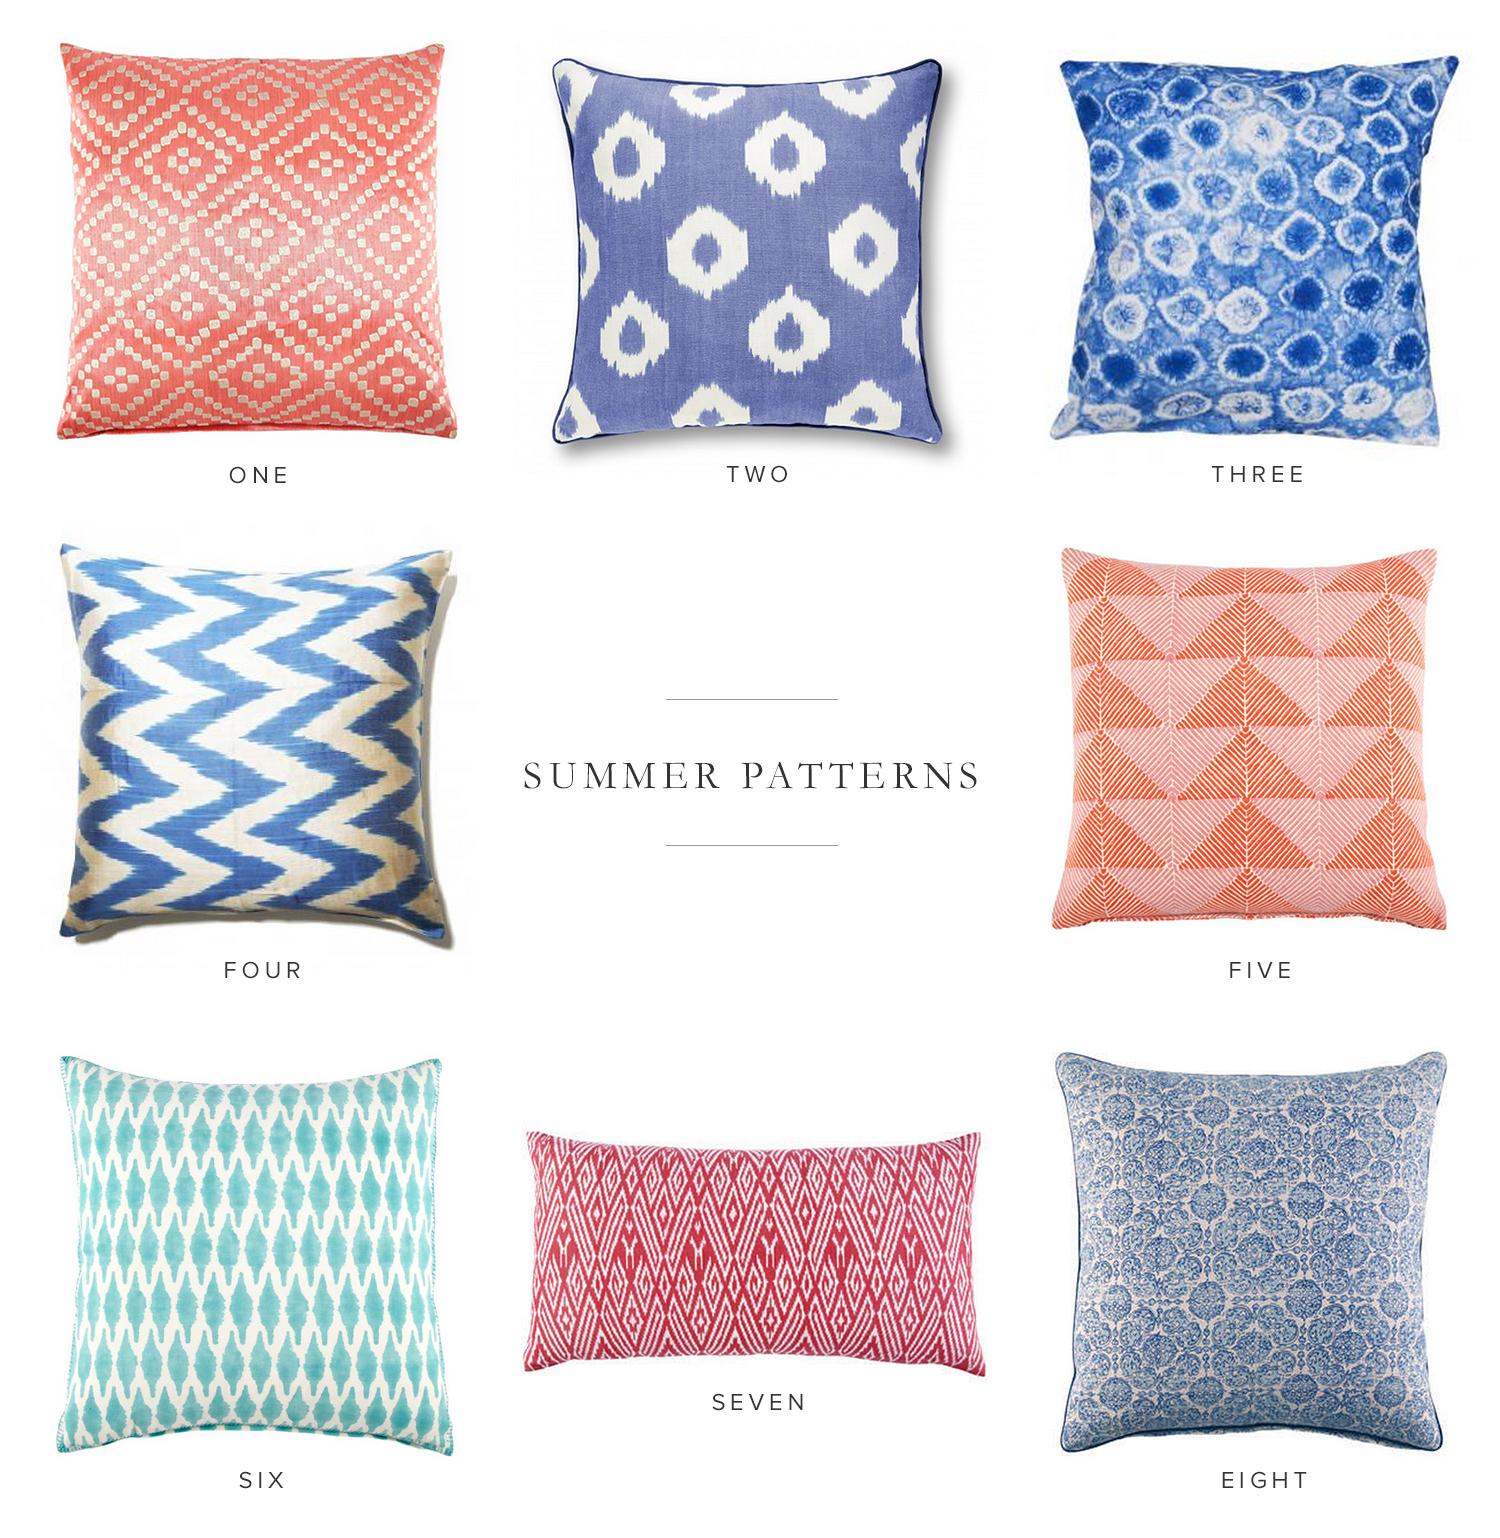 Whimsy & Grace Blog | Throw Pillows